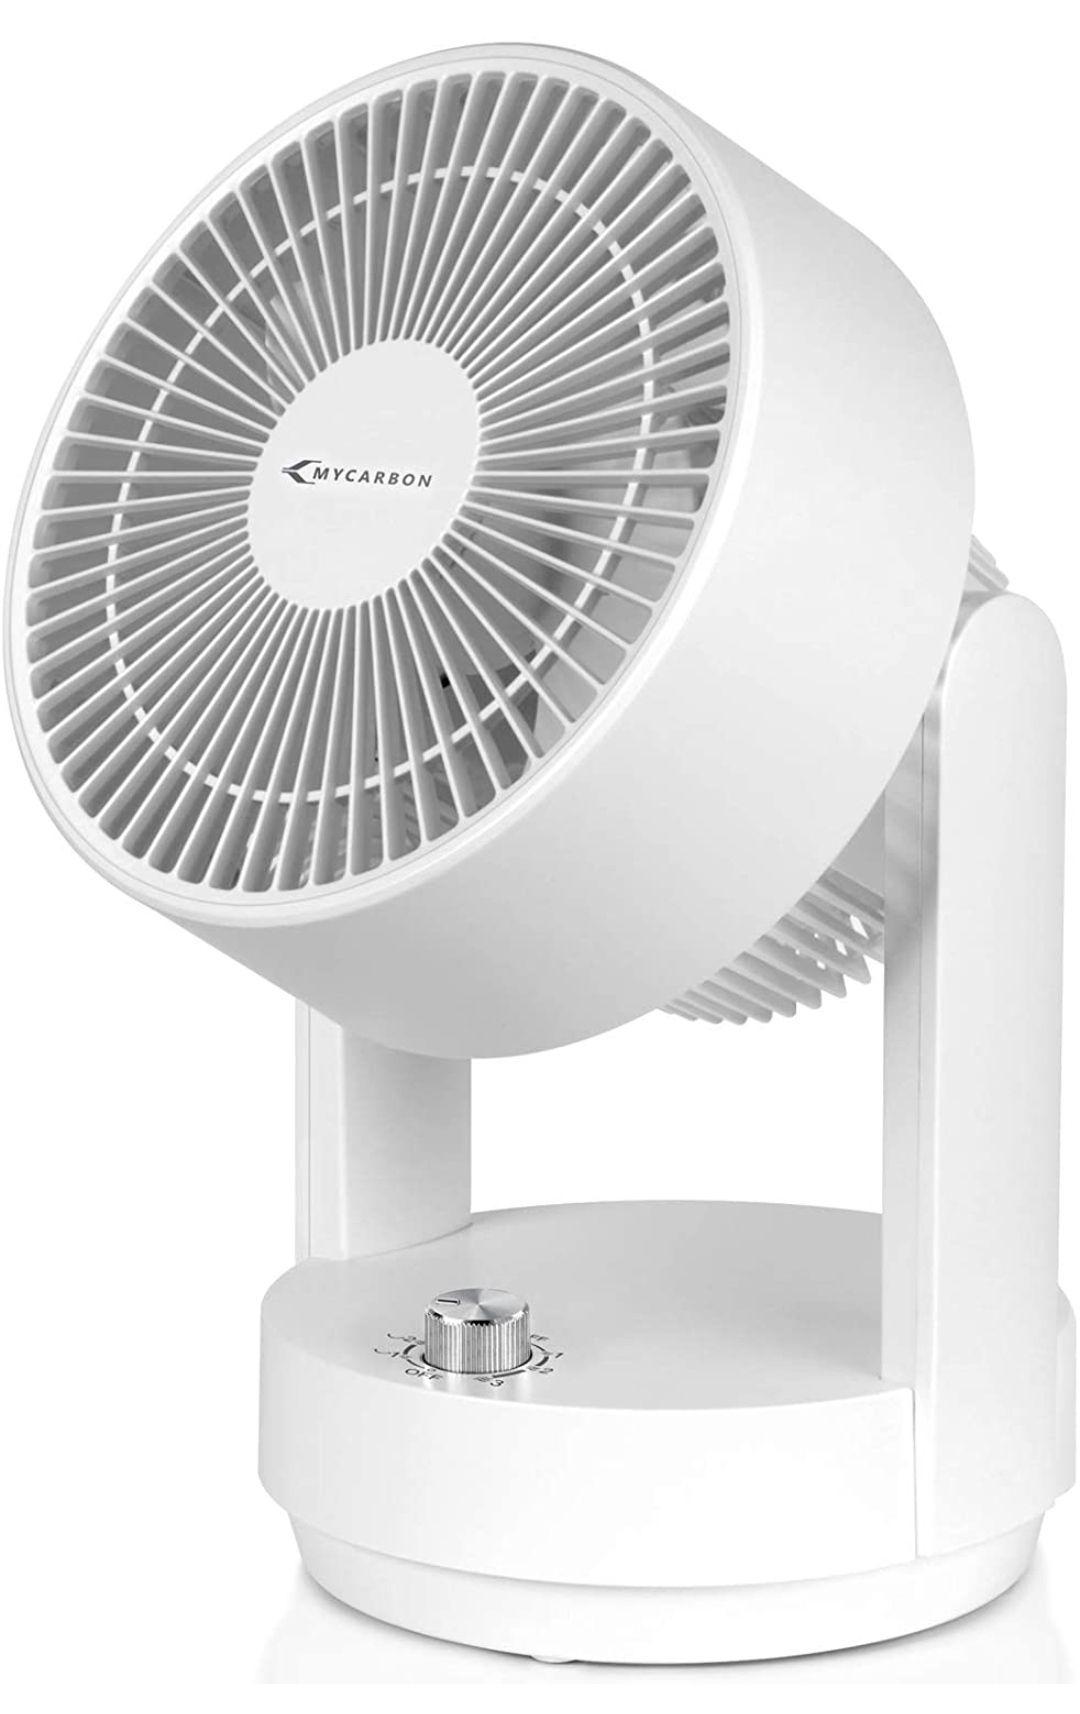 Ventilador de Mesa Ventilador Silencioso con 3 Velocidades Oscilante